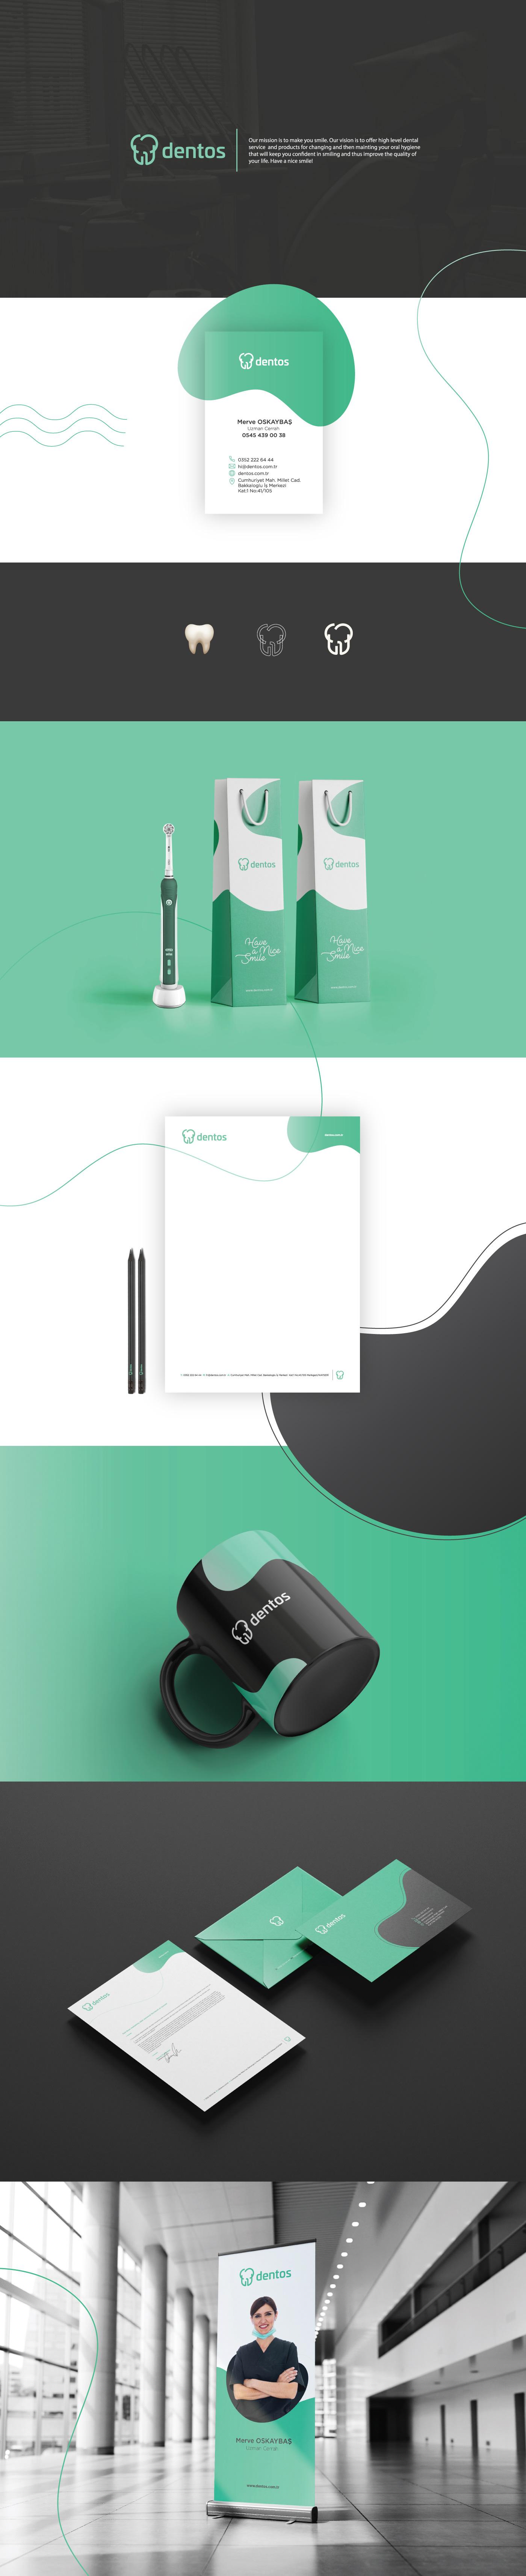 brand brandıng dental dentos desıgn   logo uı ux Web websıte